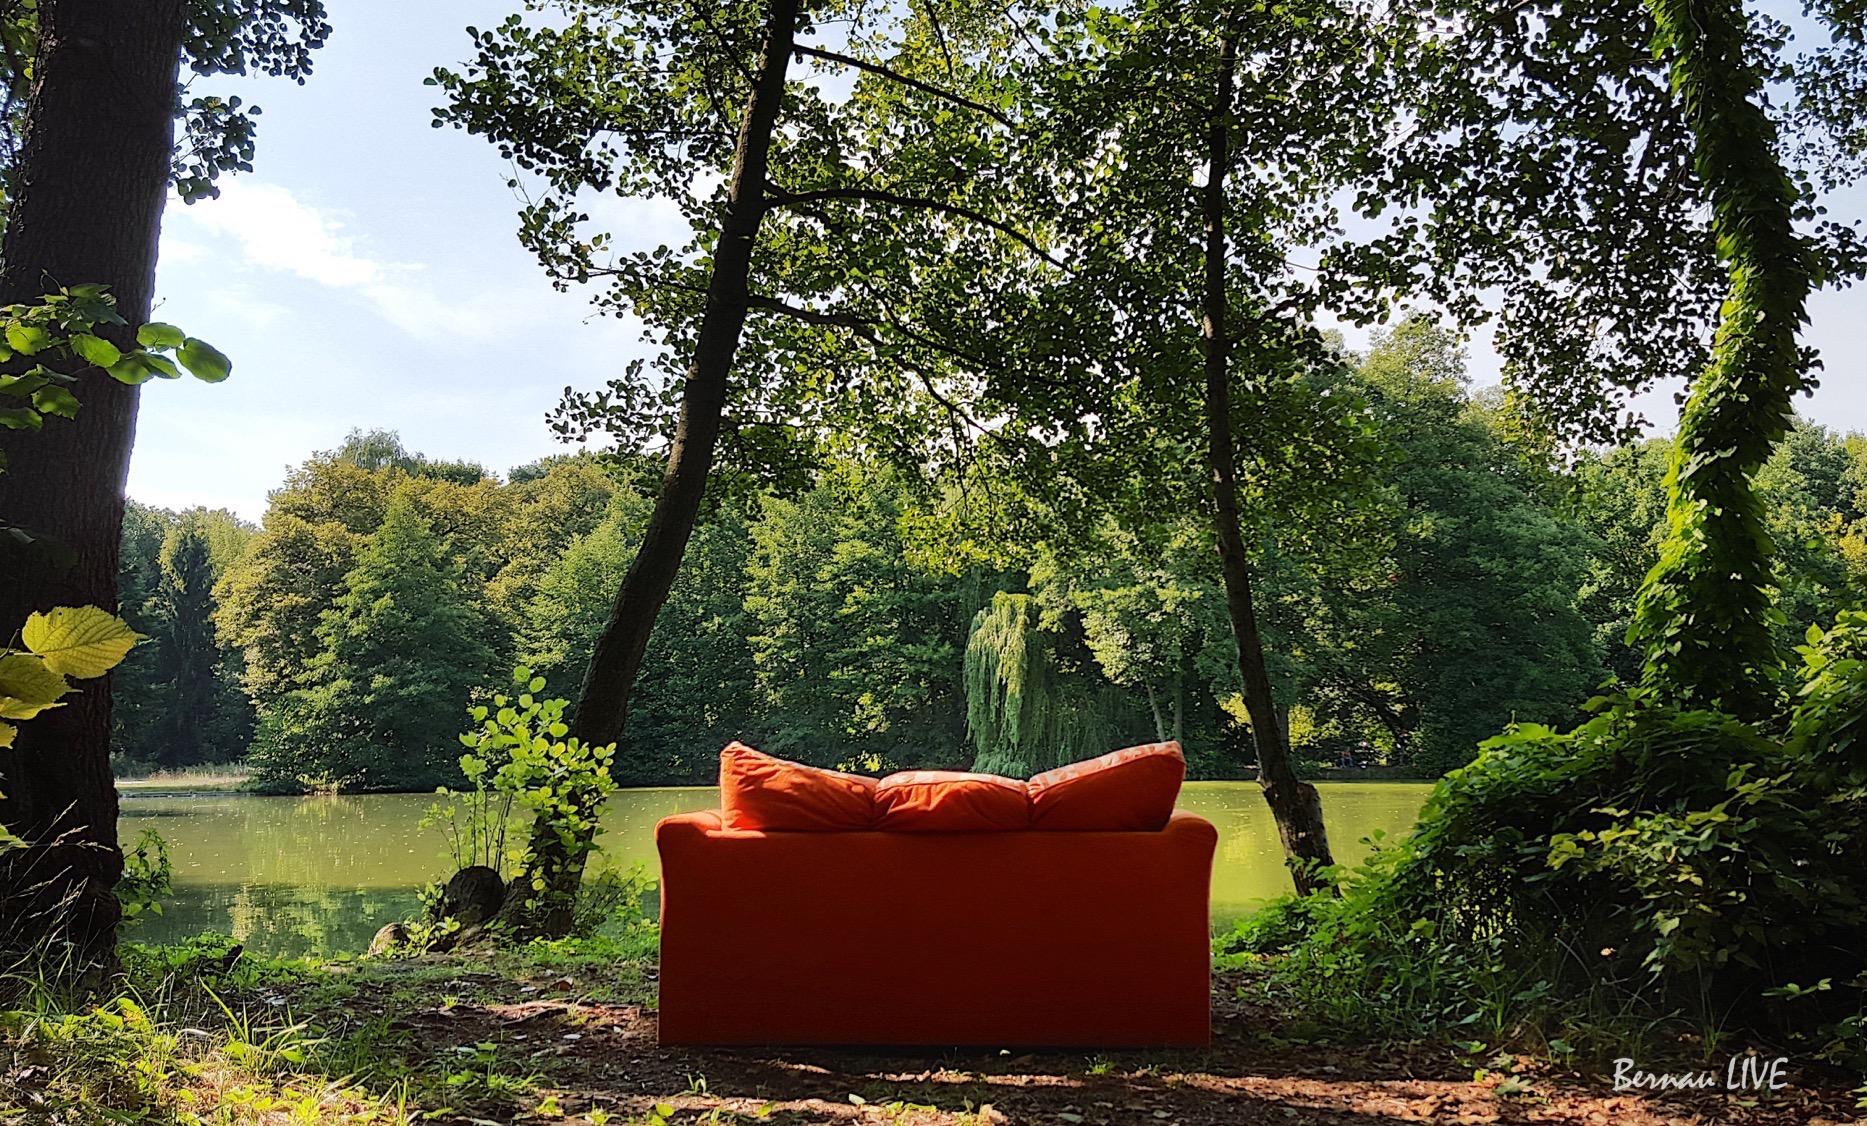 bernau barnim willkommen im september guten morgen. Black Bedroom Furniture Sets. Home Design Ideas